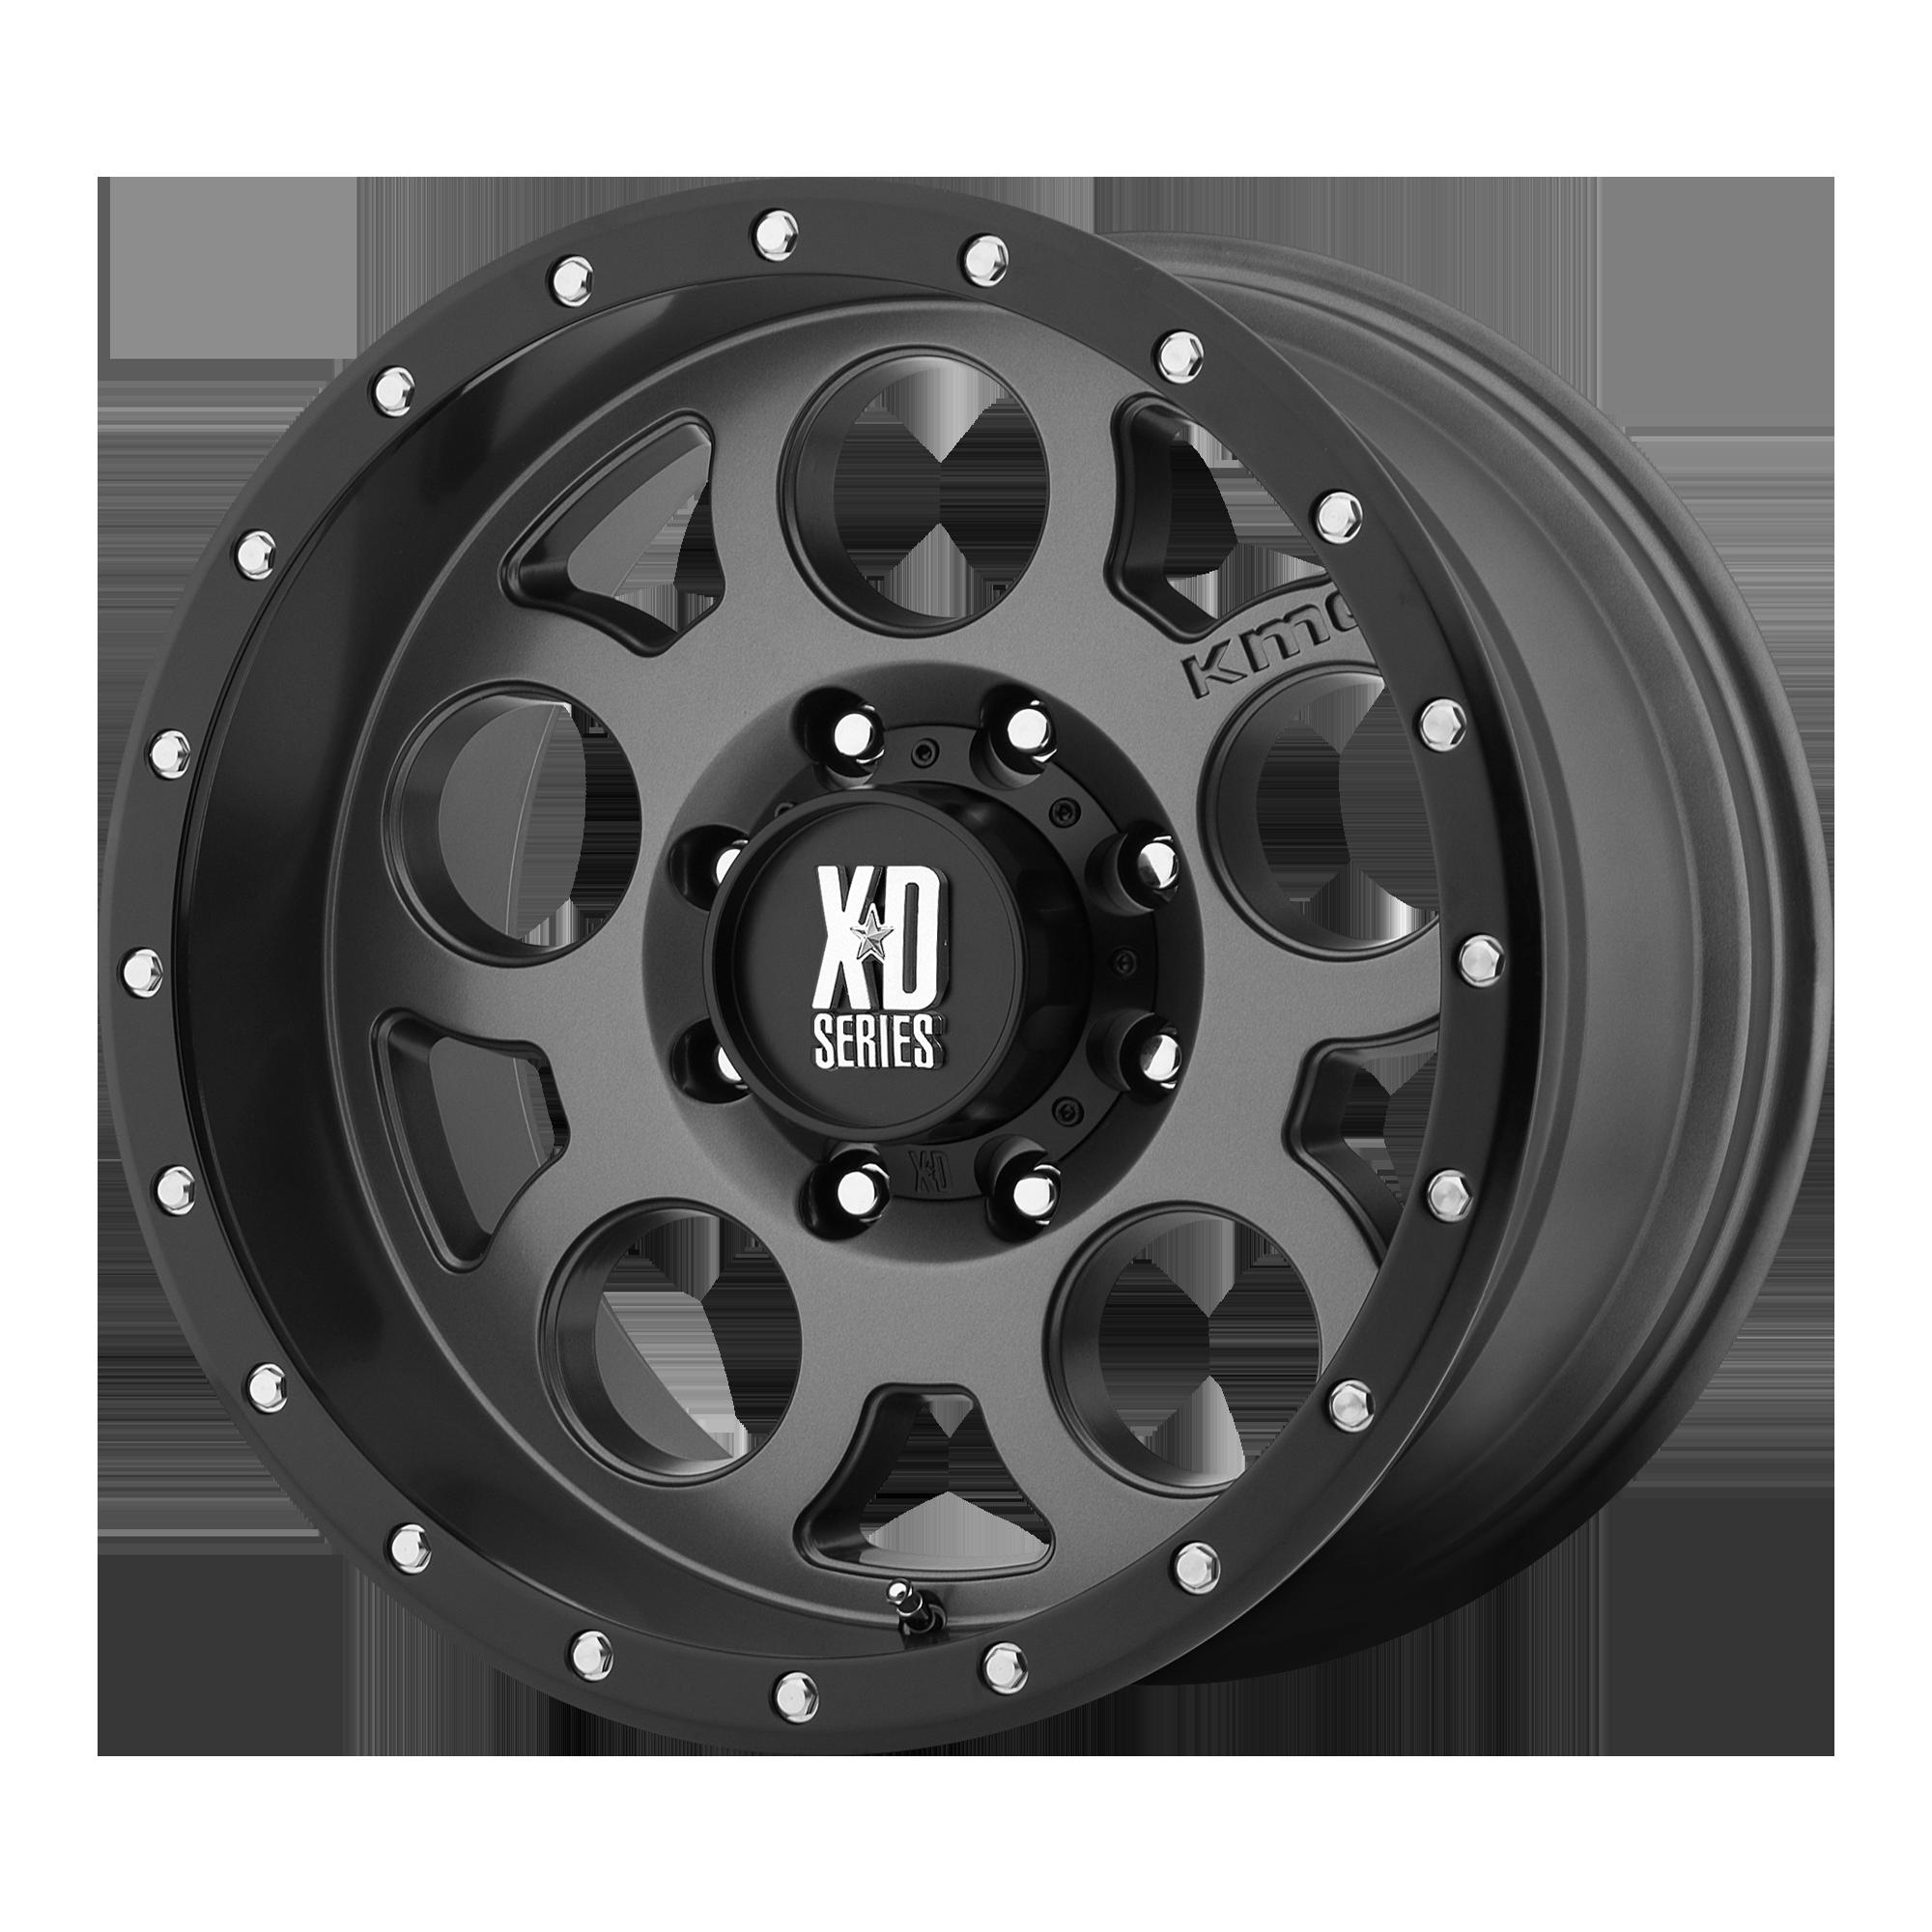 XD SERIES XD126 ENDURO PRO hliníkové disky 9x18 6x139,7 ET18 Matte Gray W Black Reinforcing Ring